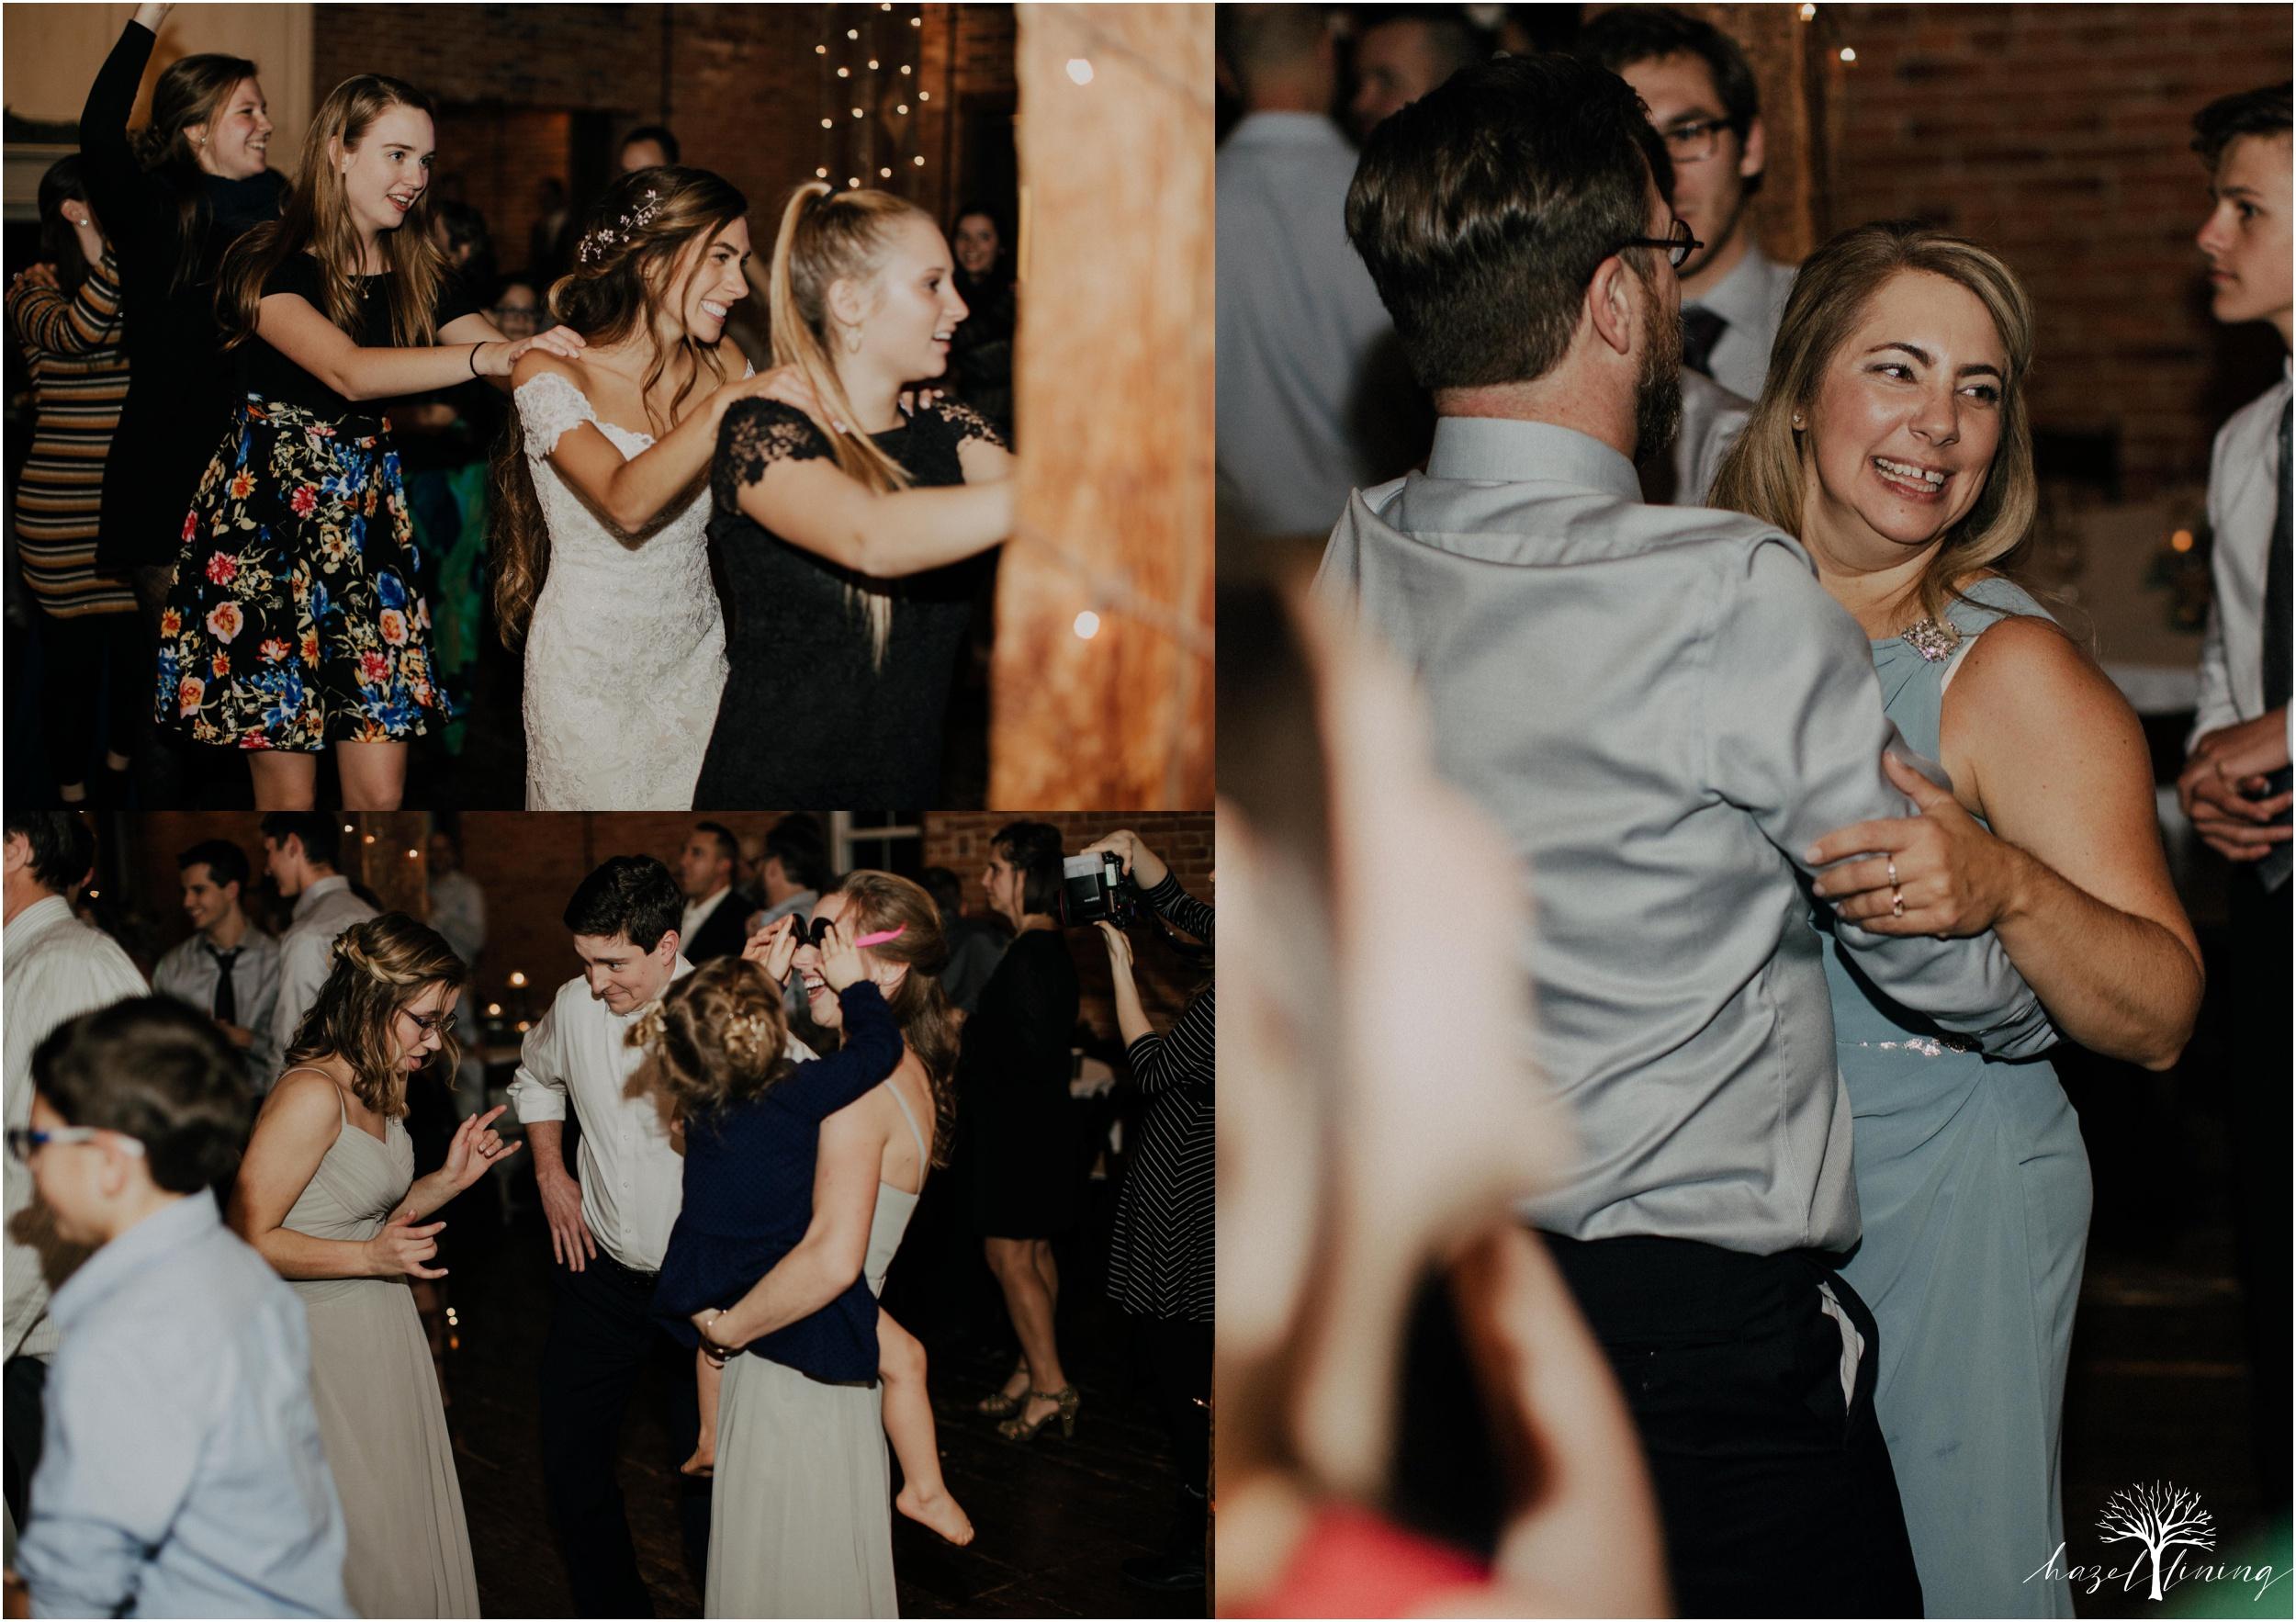 emma-matt-gehringer-the-booking-house-lancaster-manhiem-pennsylvania-winter-wedding_0182.jpg